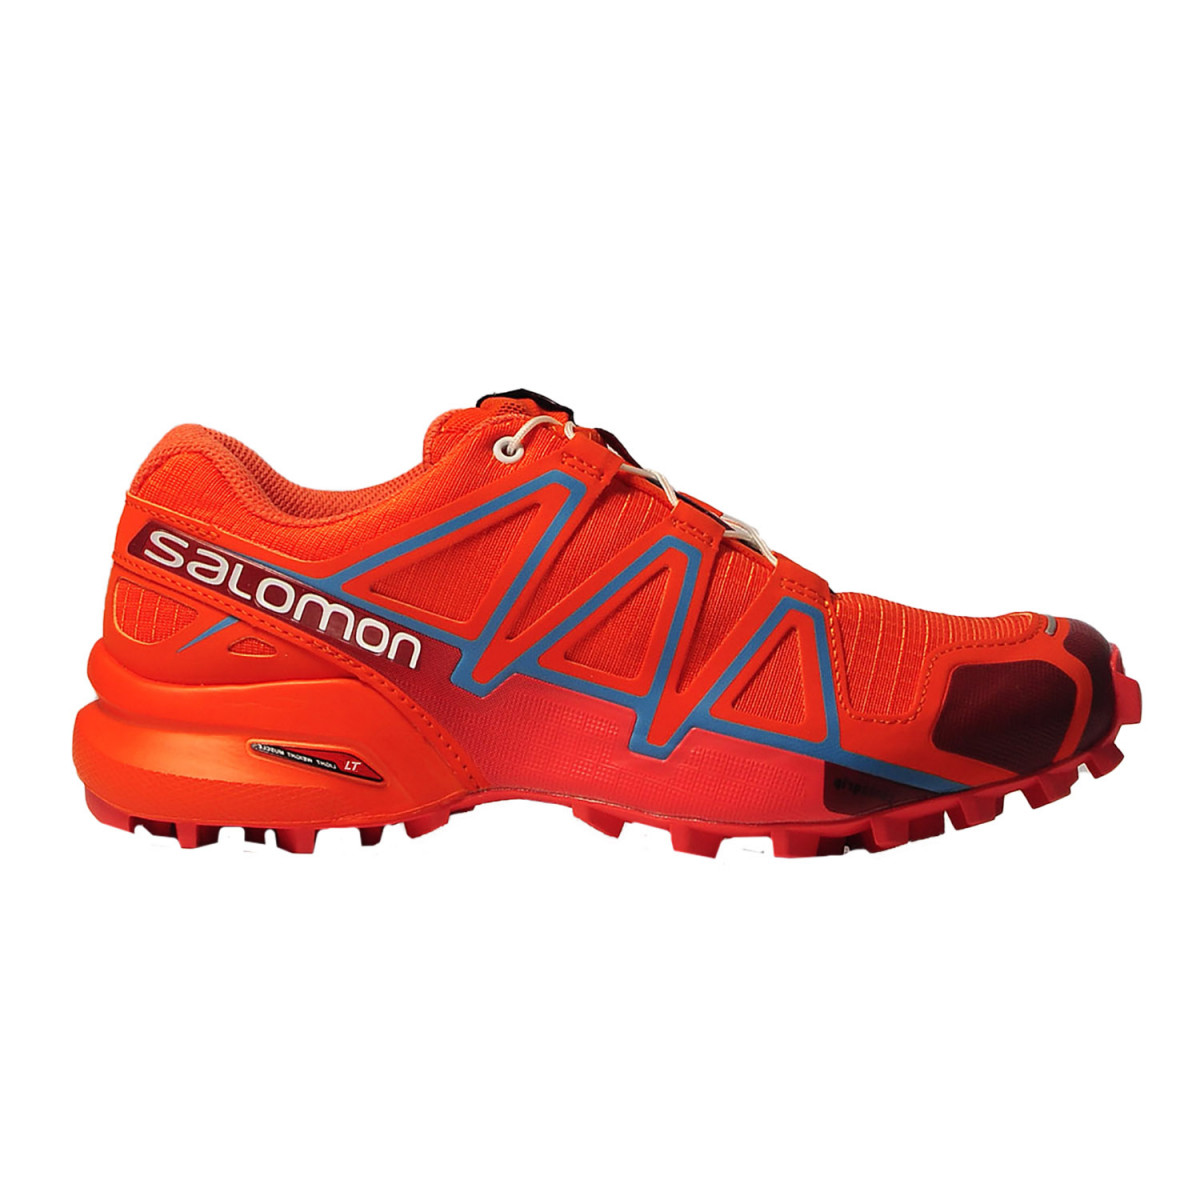 b97cfc300ce Zapatillas Salomon Speedcross 4 W - Adventure - Zapatillas - Mujer